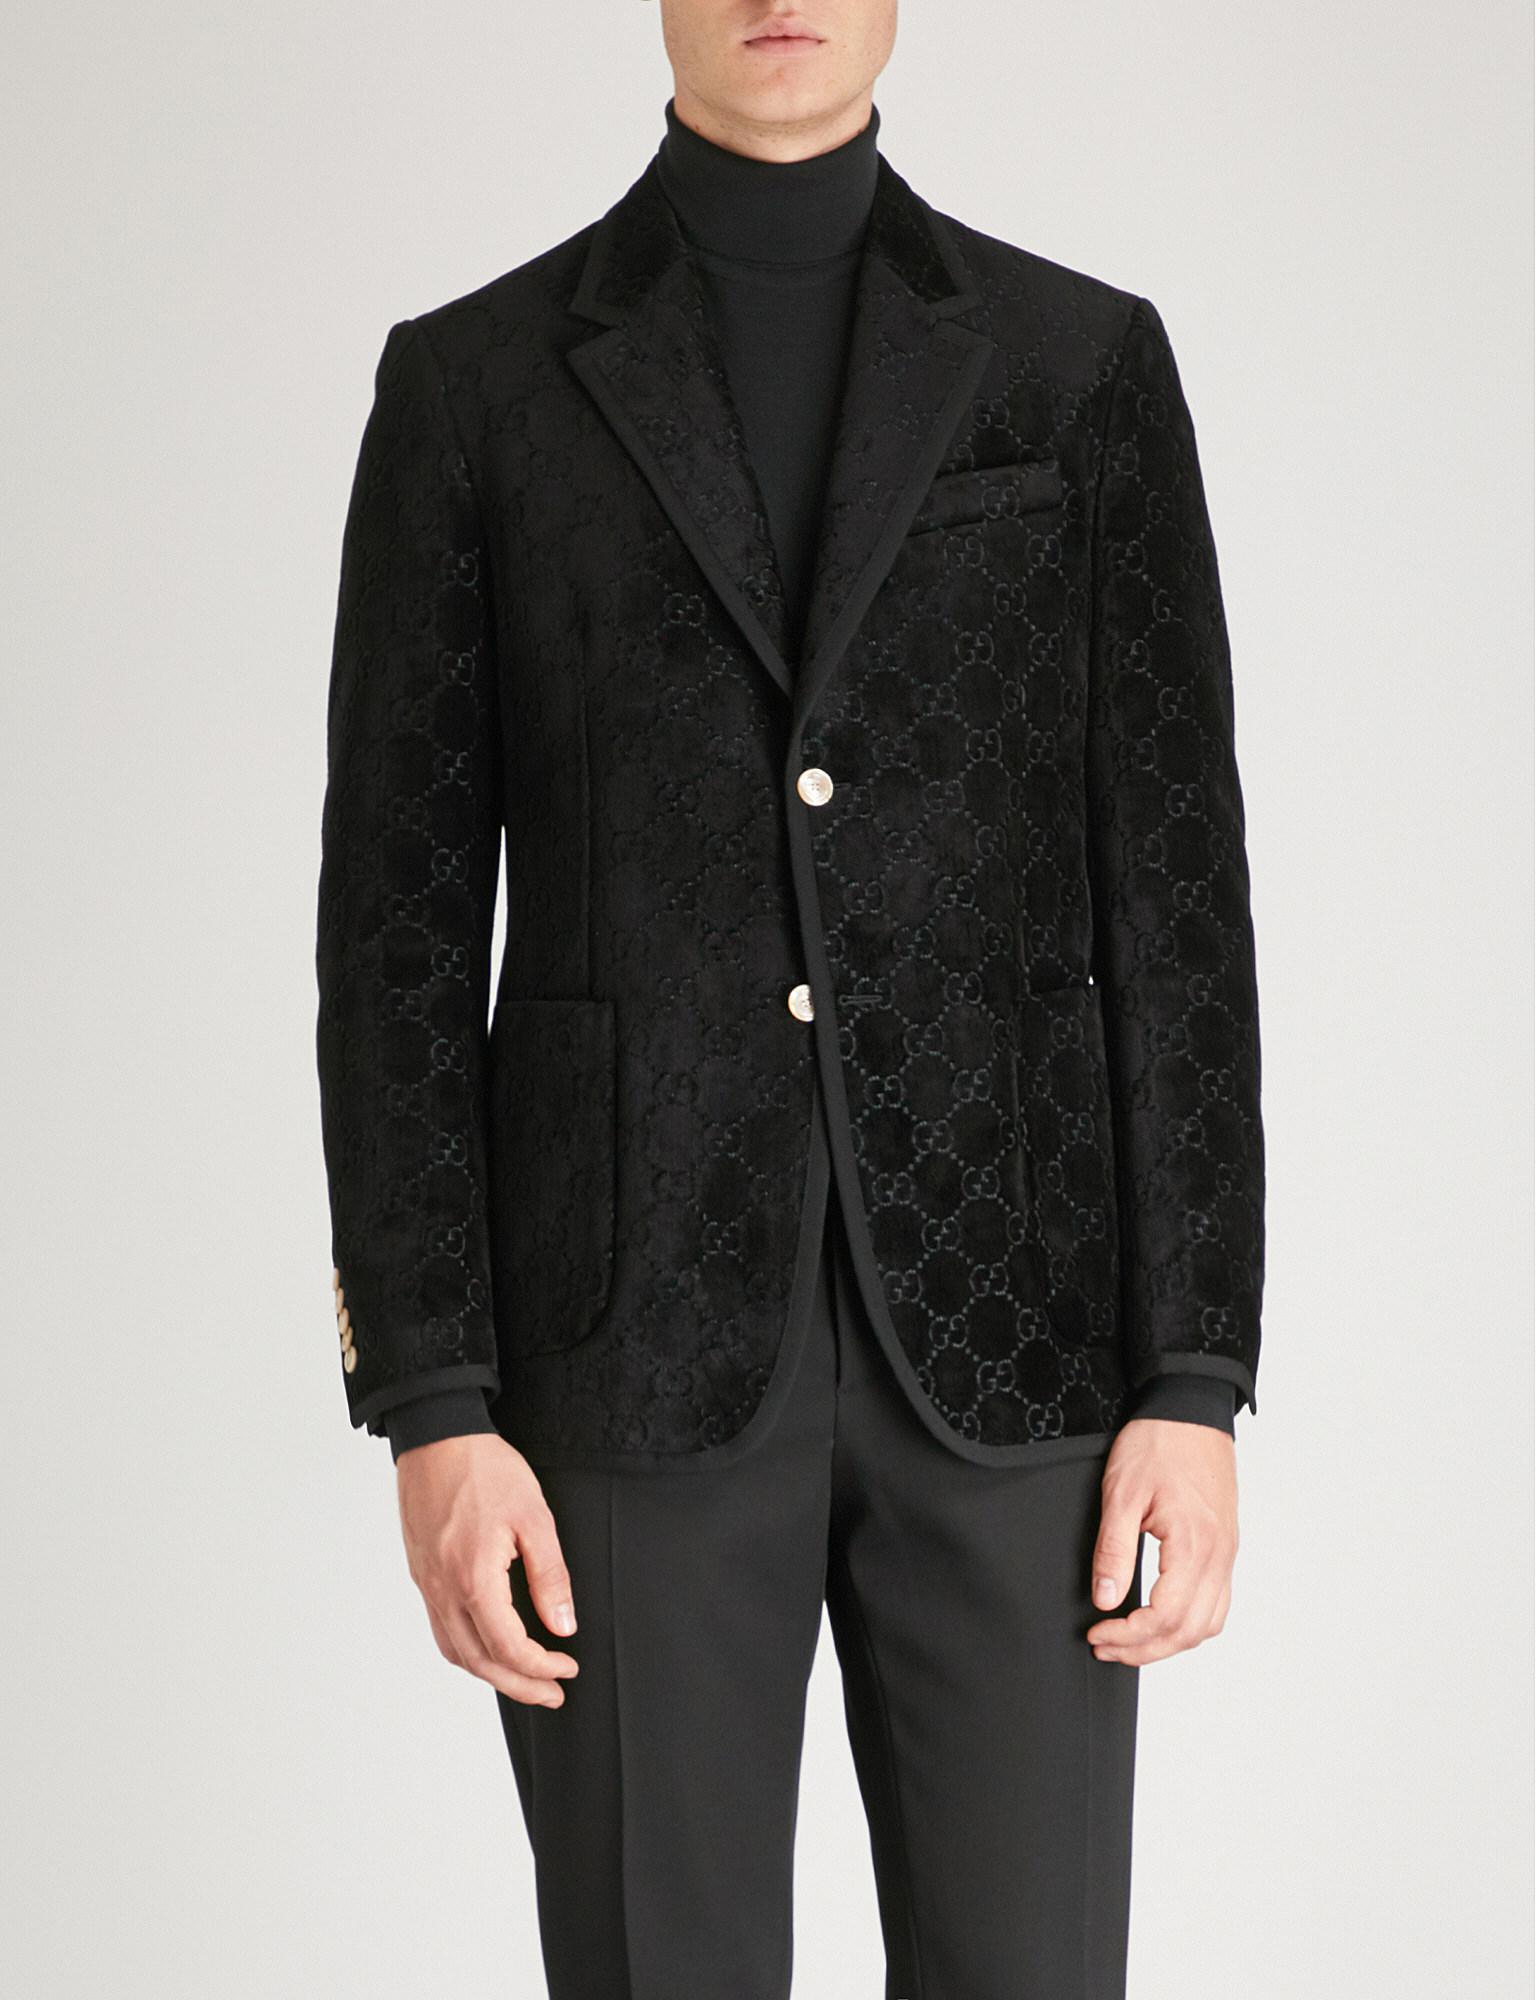 882a15f10 Gucci Palma GG Regular-fit Velvet Jacket in Black for Men - Lyst